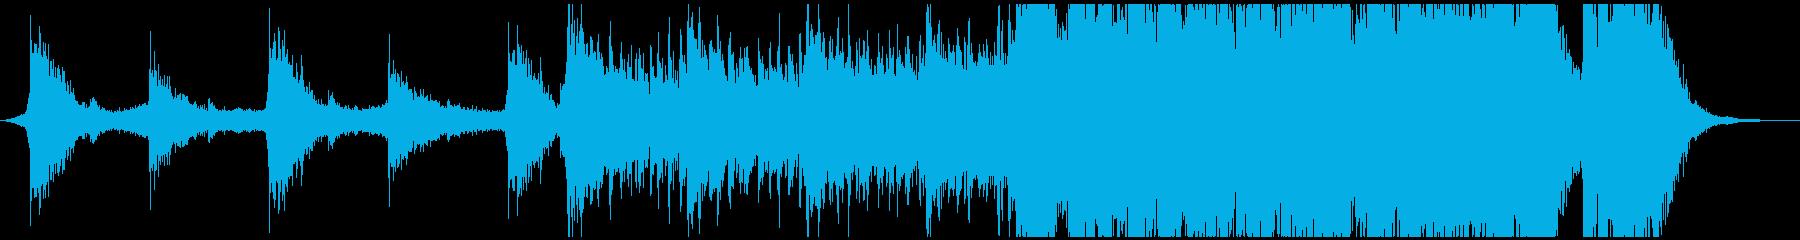 Strike VIIIの再生済みの波形